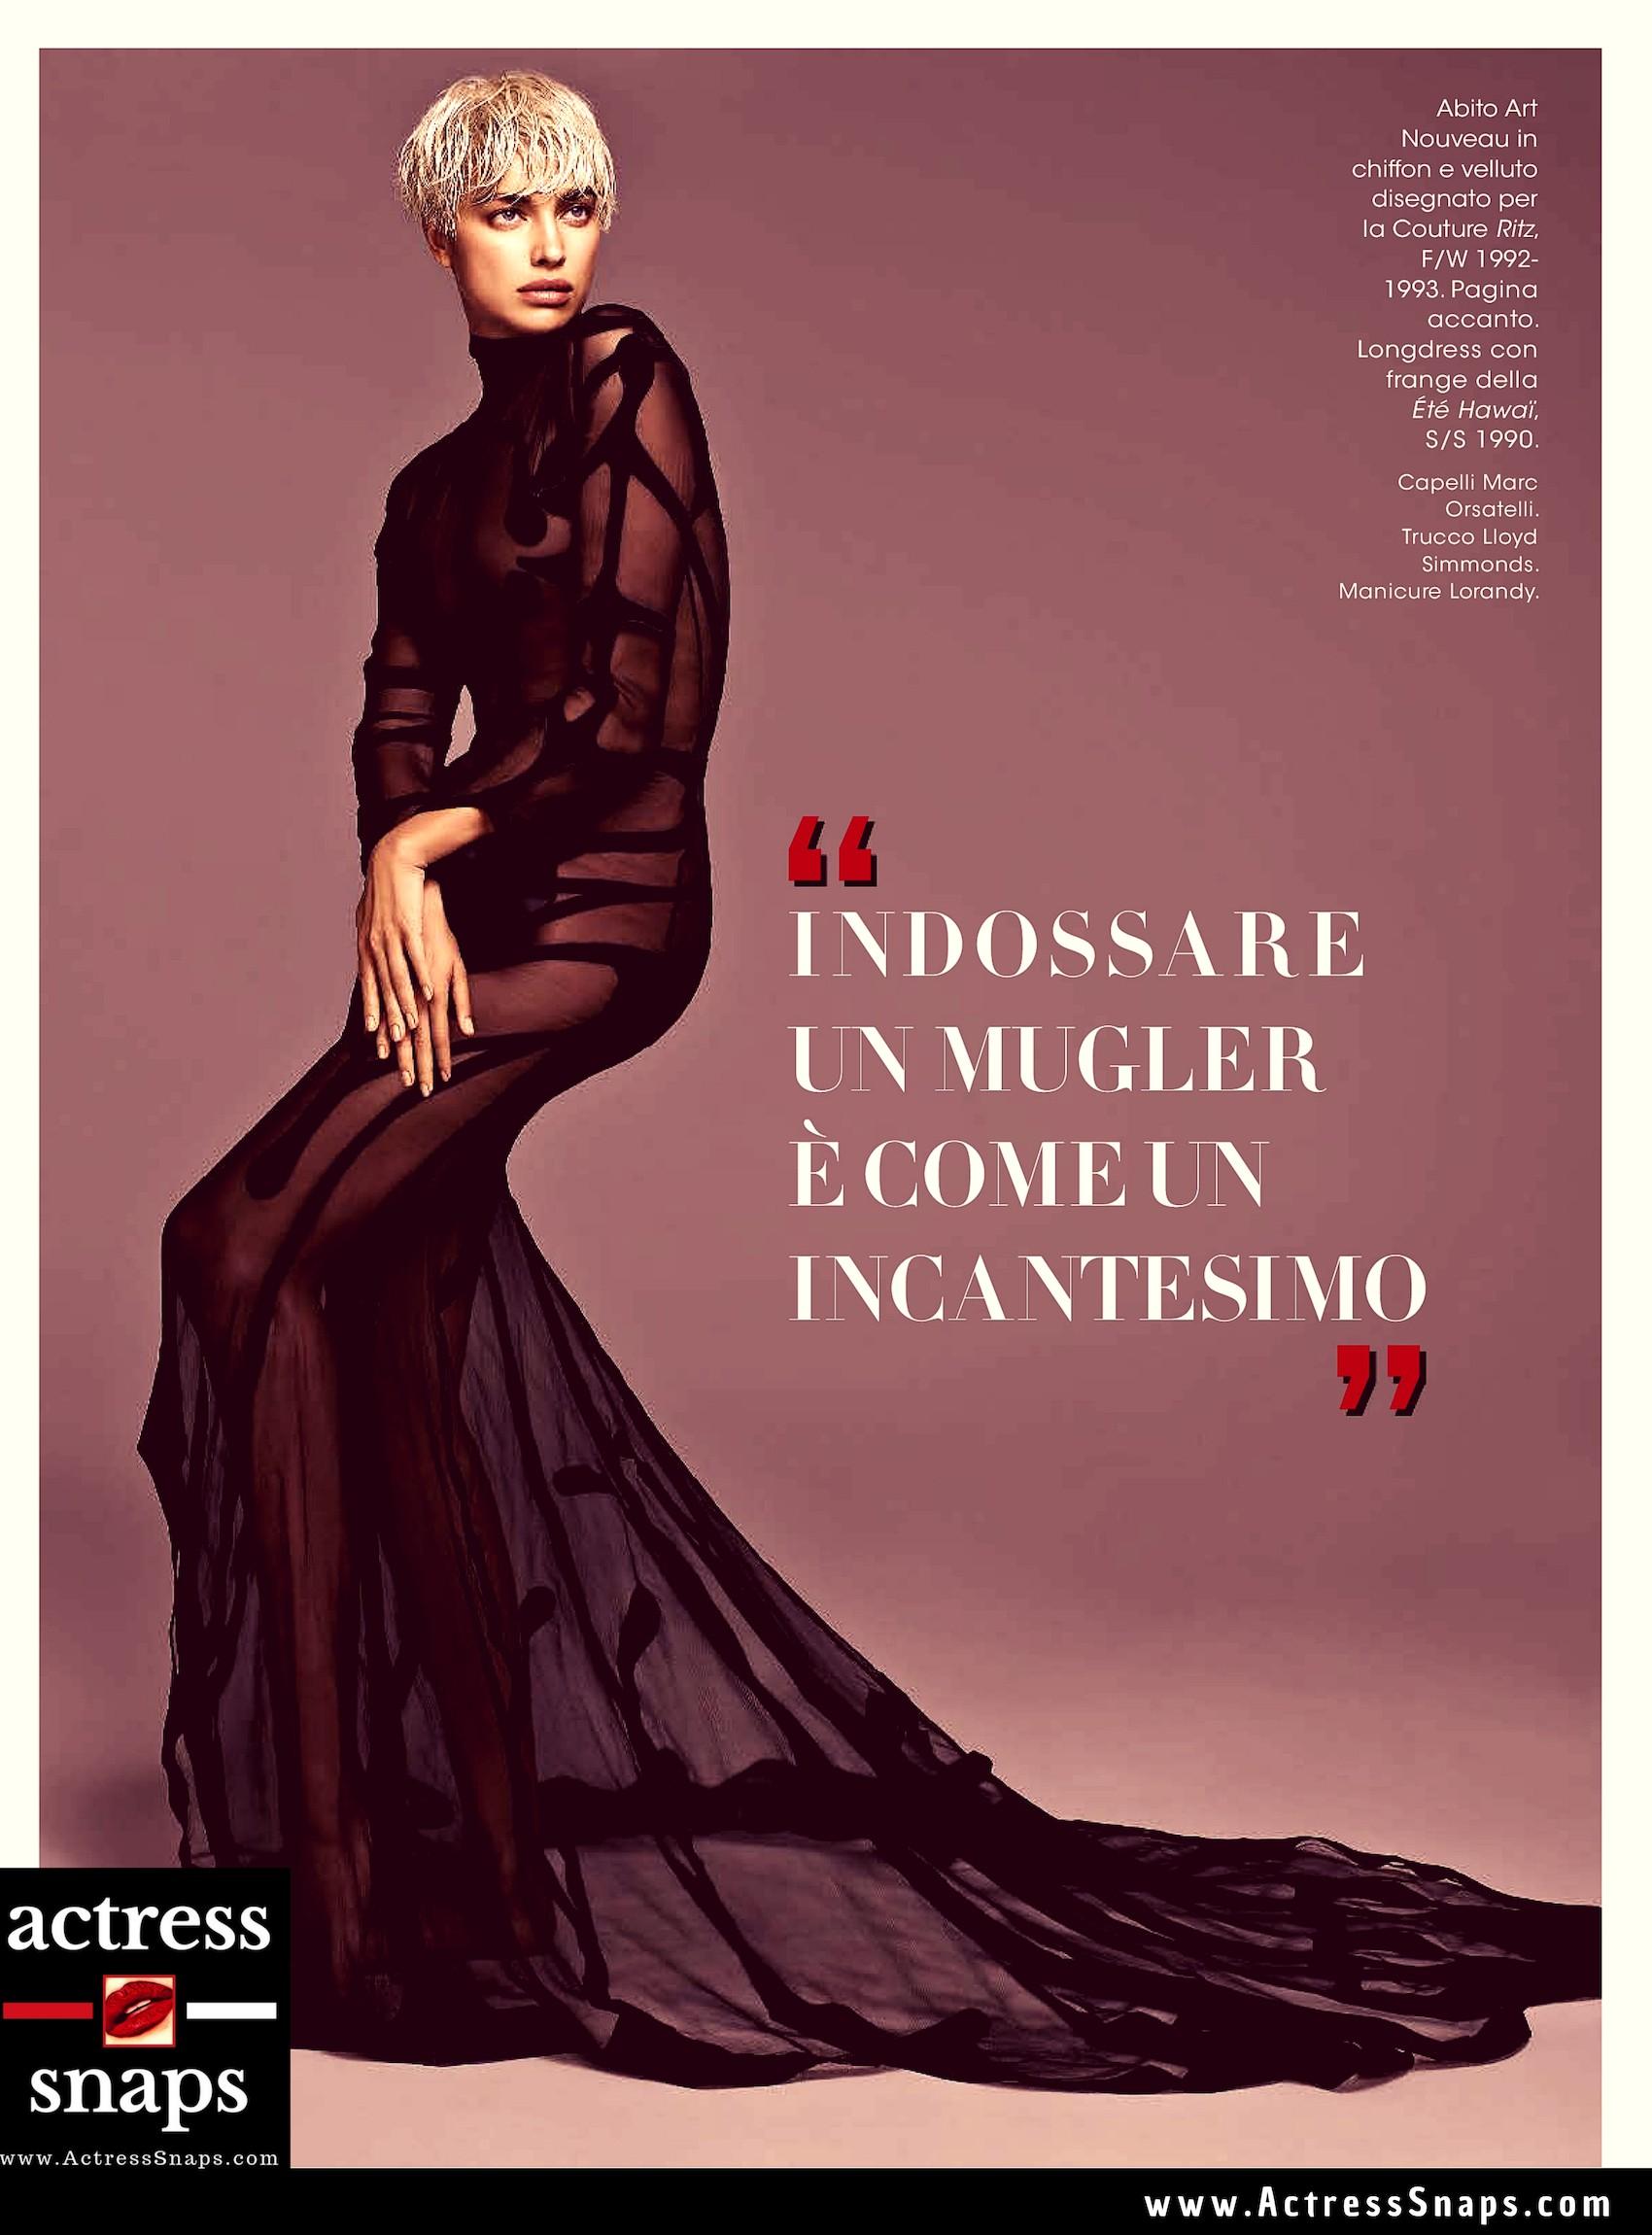 Irina Shayk - Glamour Italia Magazine - Sexy Actress Pictures   Hot Actress Pictures - ActressSnaps.com